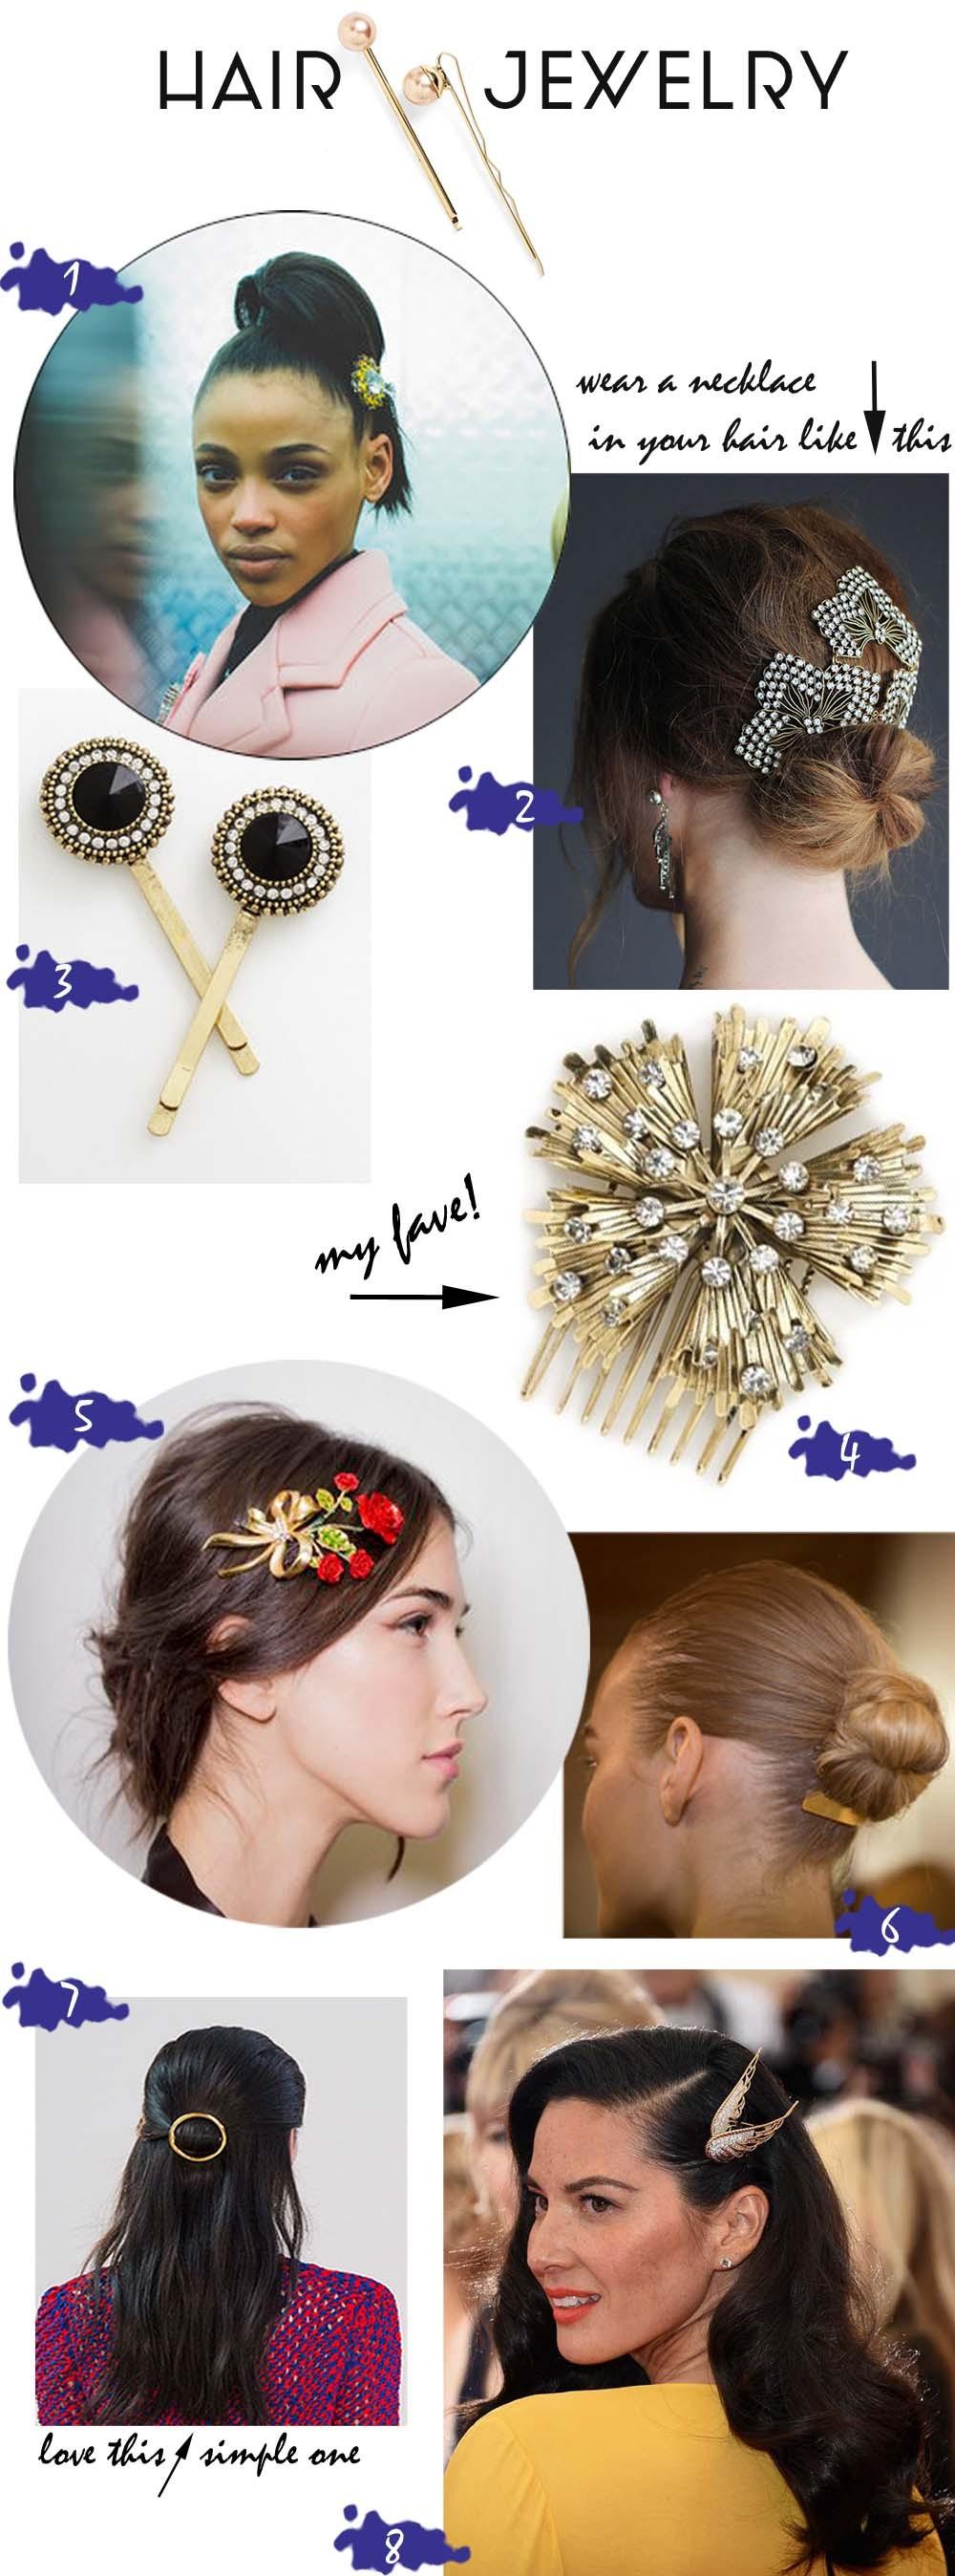 hair jewelry 14